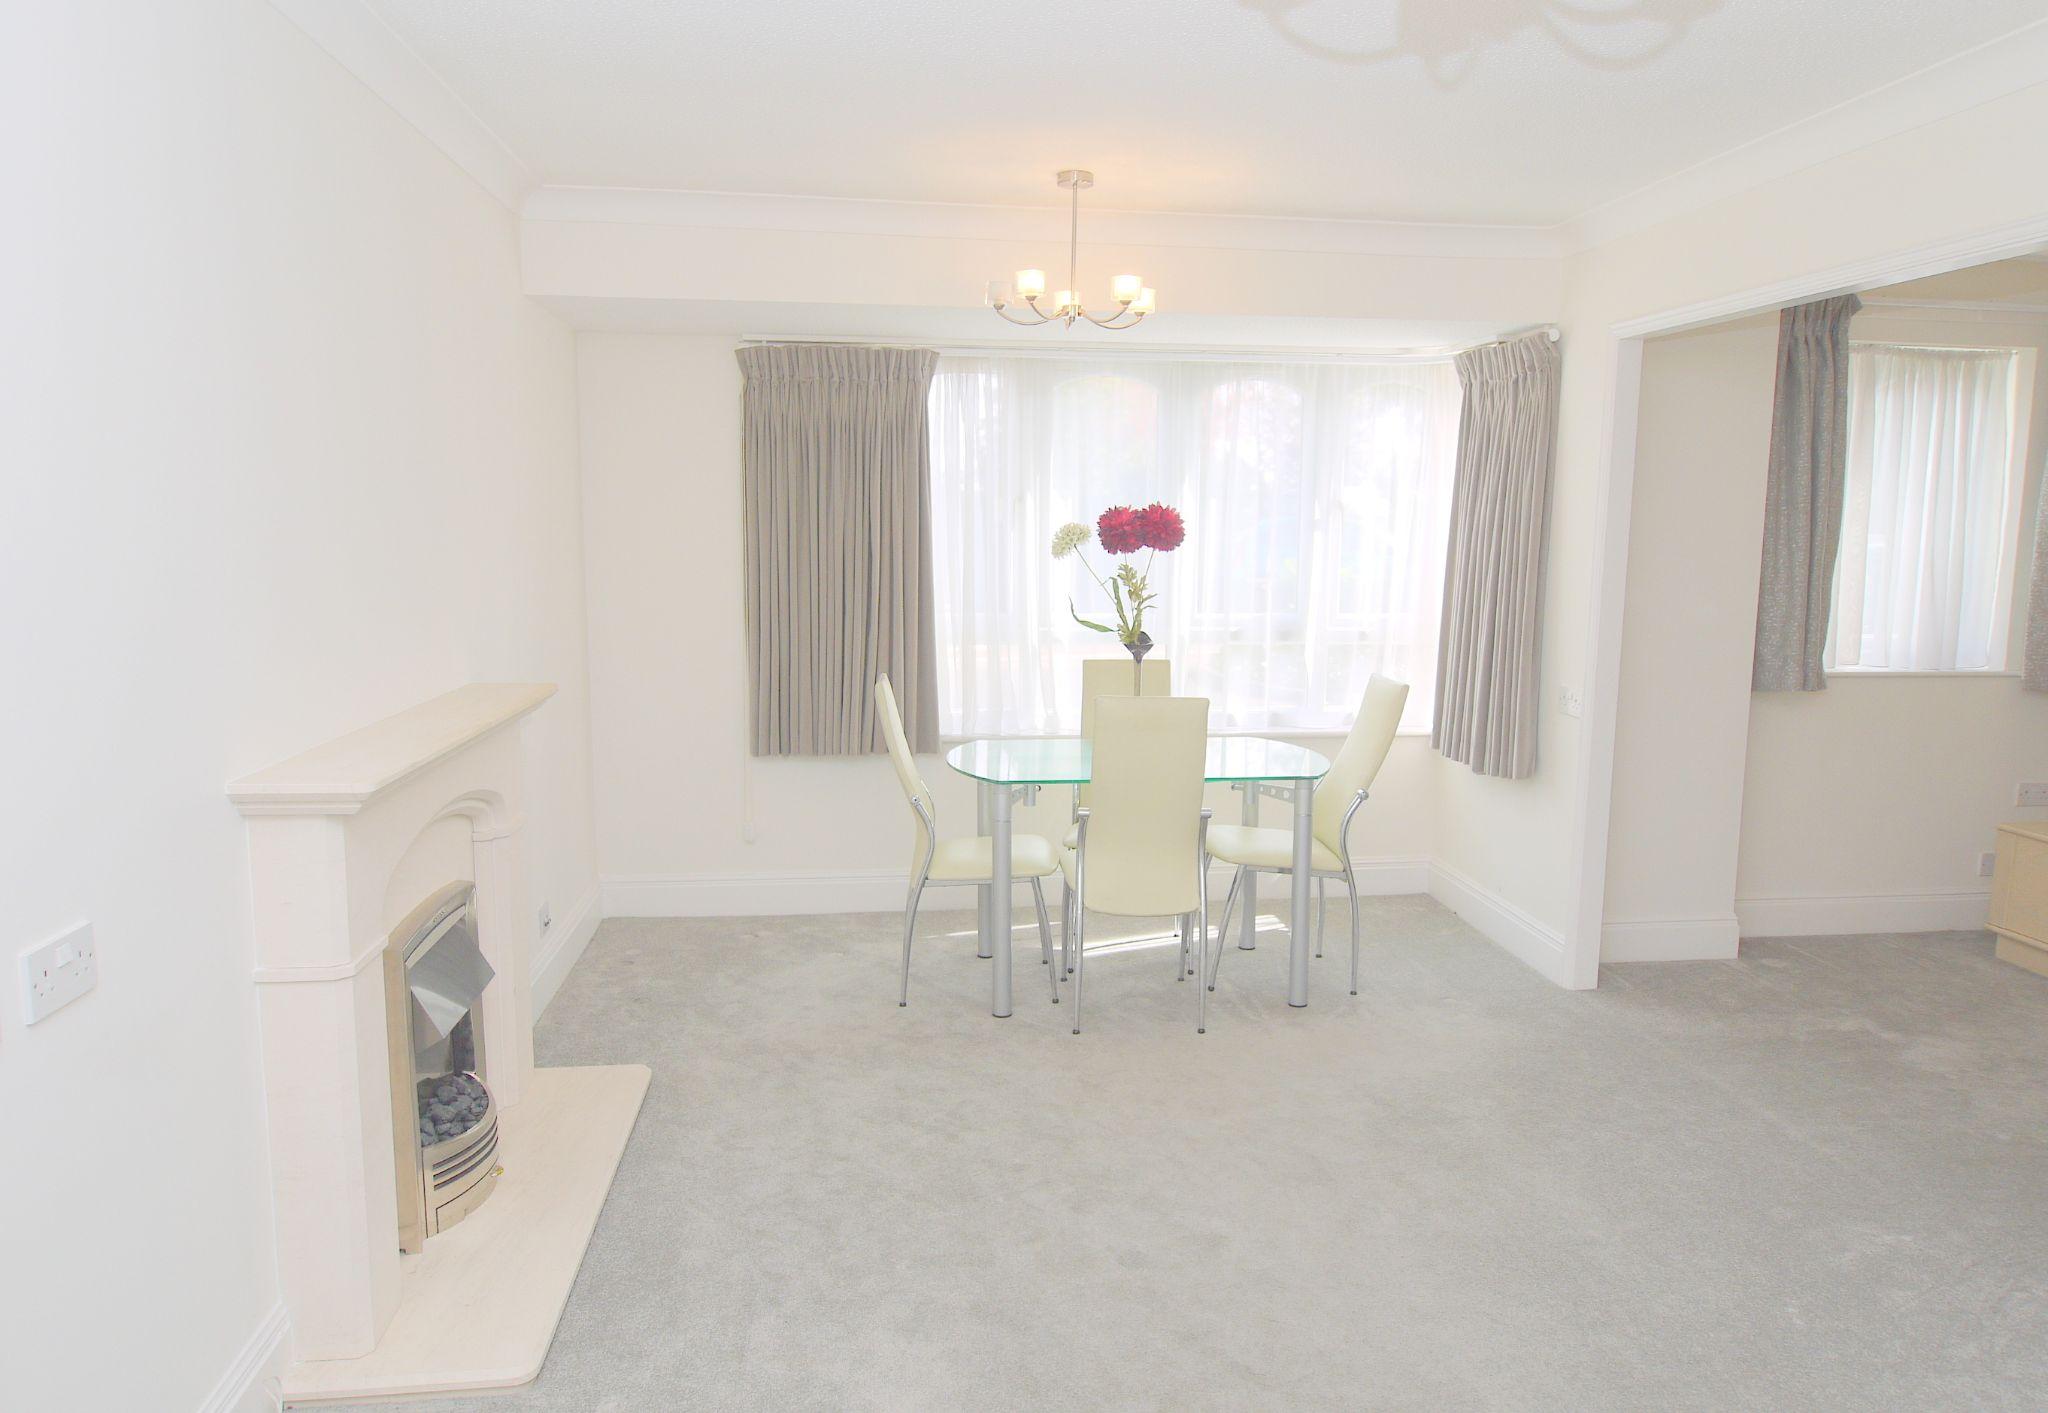 1 bedroom apartment For Sale in Sevenoaks - Photograph 4